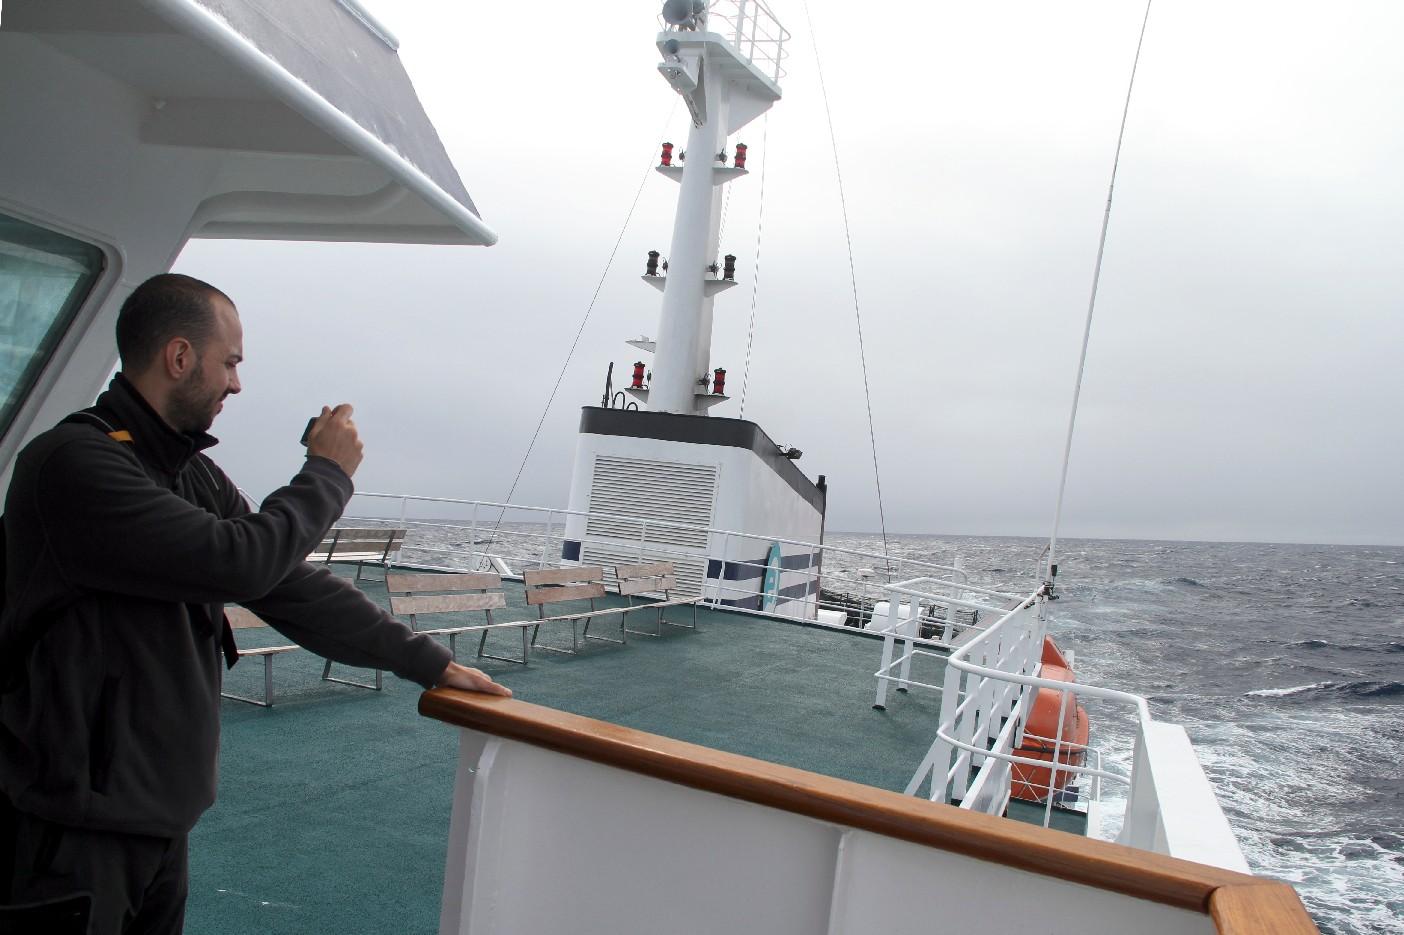 Cruzando o Drake, rumo à Antártica (foto: Eduardo Vessoni)